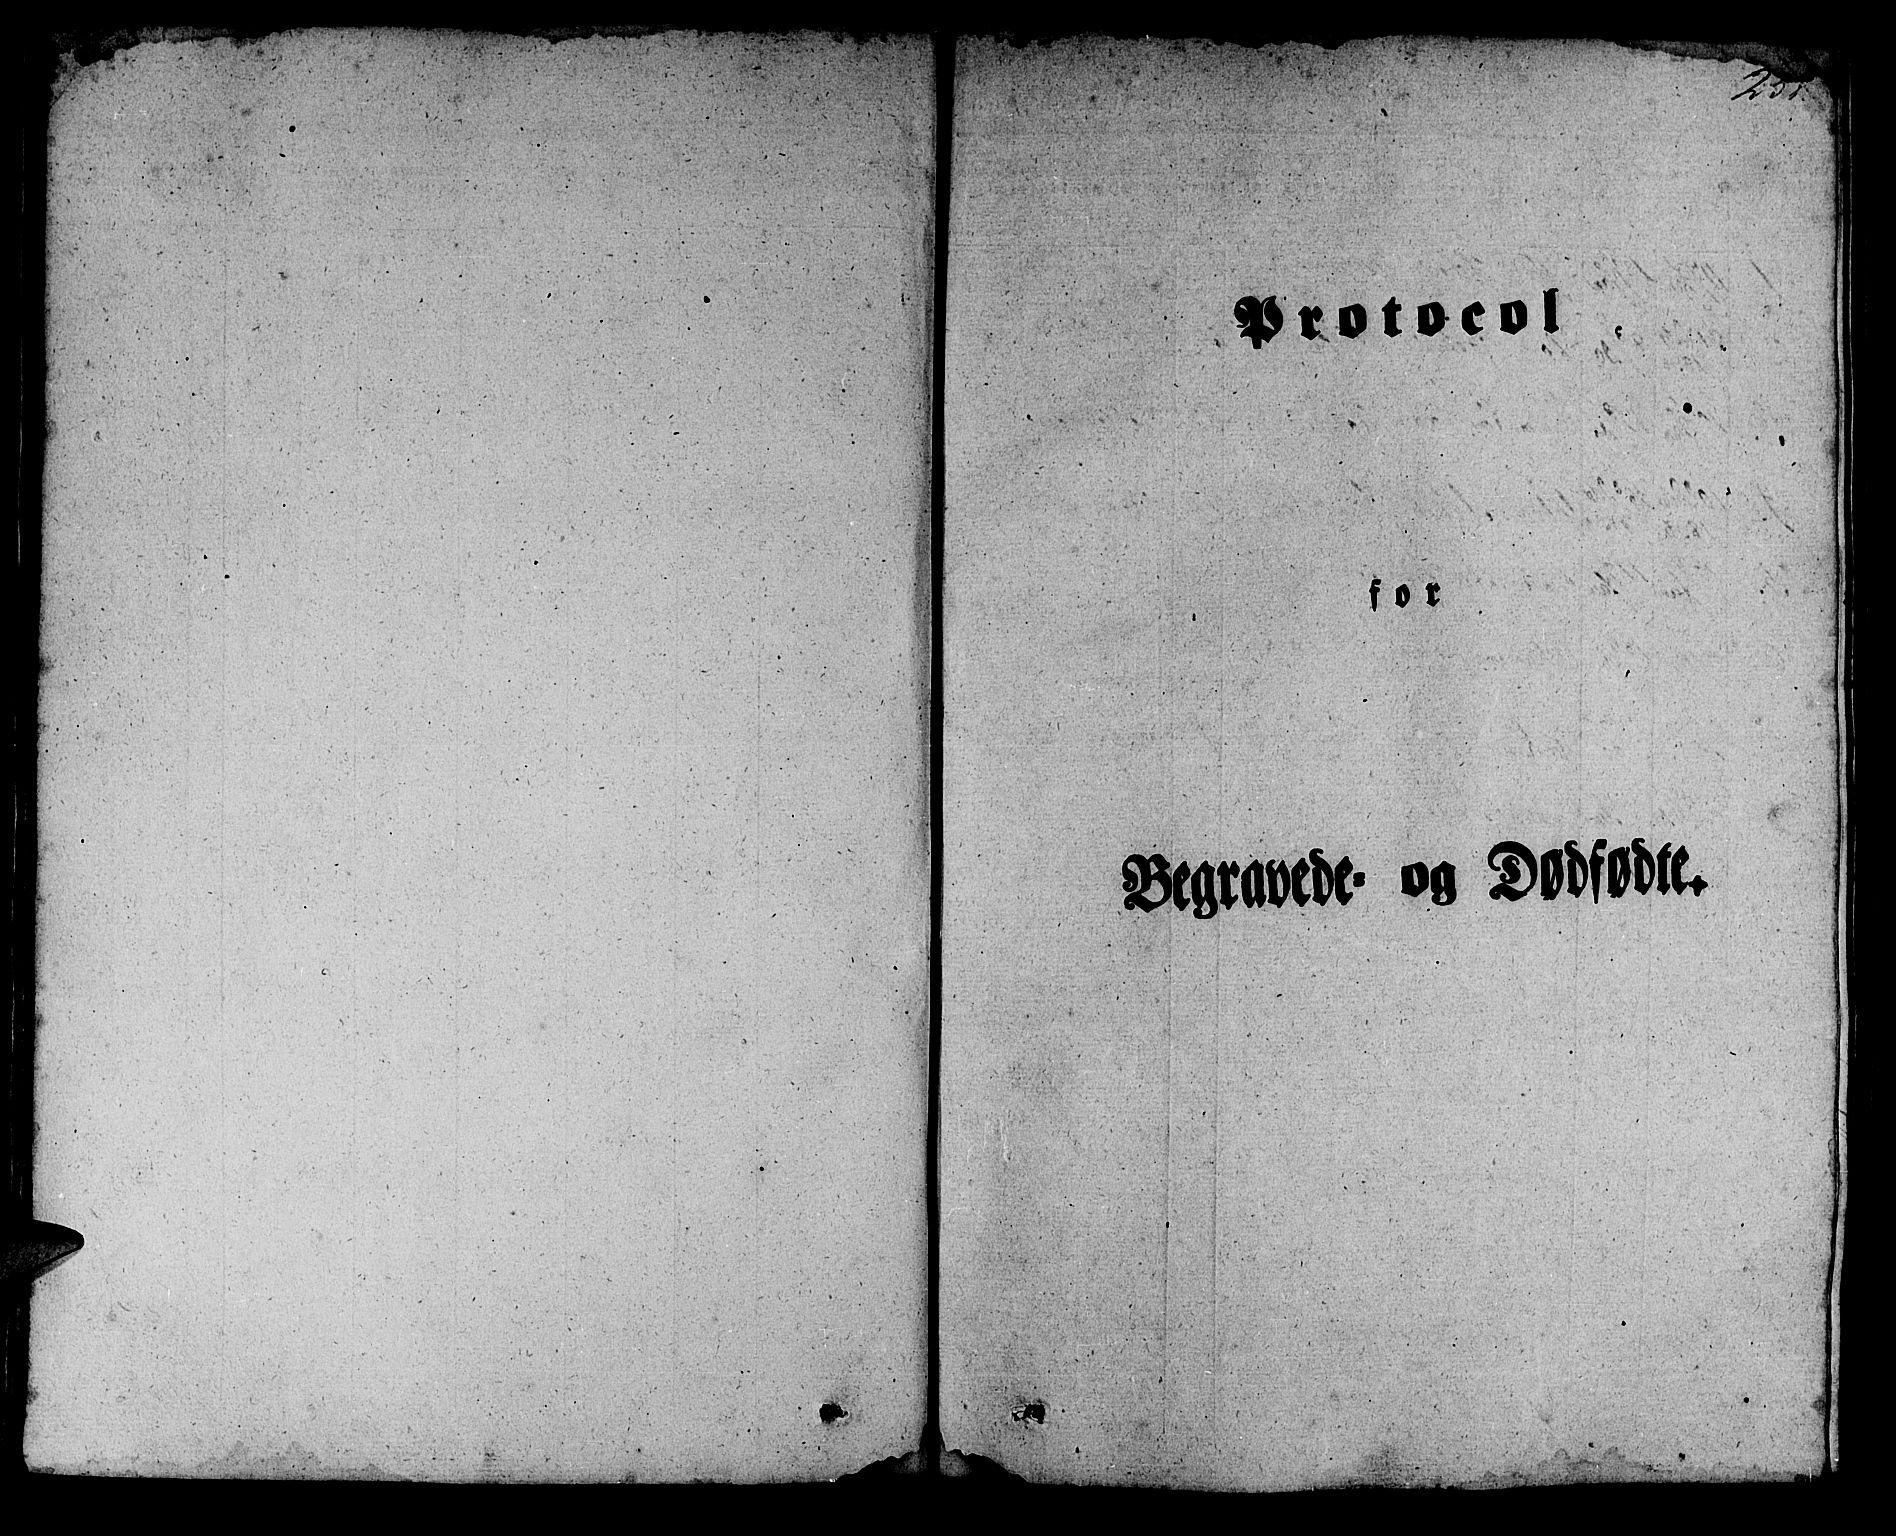 SAB, Manger sokneprestembete, H/Haa: Ministerialbok nr. A 5, 1839-1848, s. 251